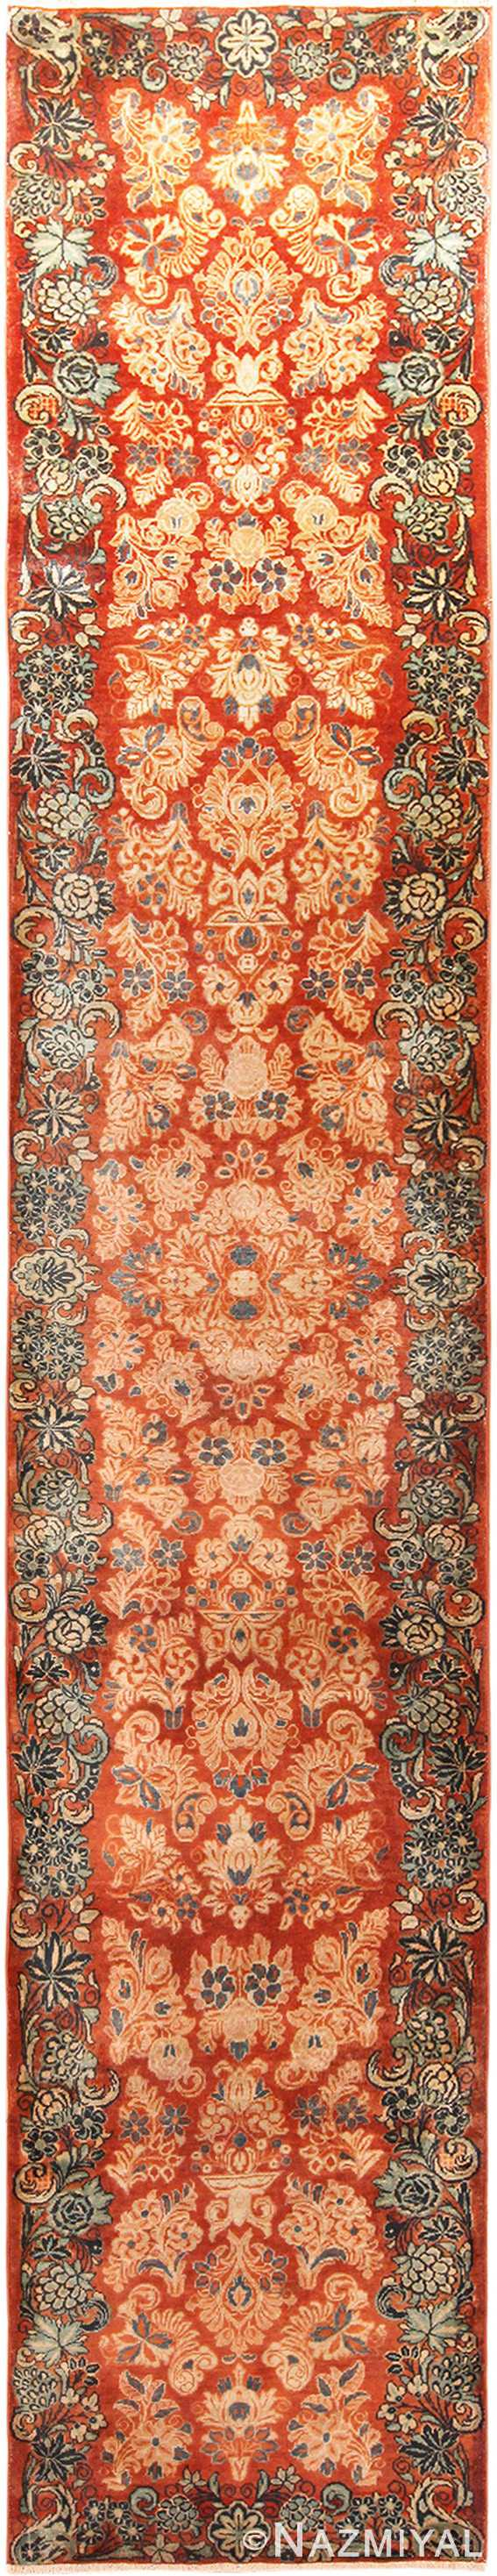 Floral Antique Persian Sarouk Runner 70817 by Nazmiyal NYC